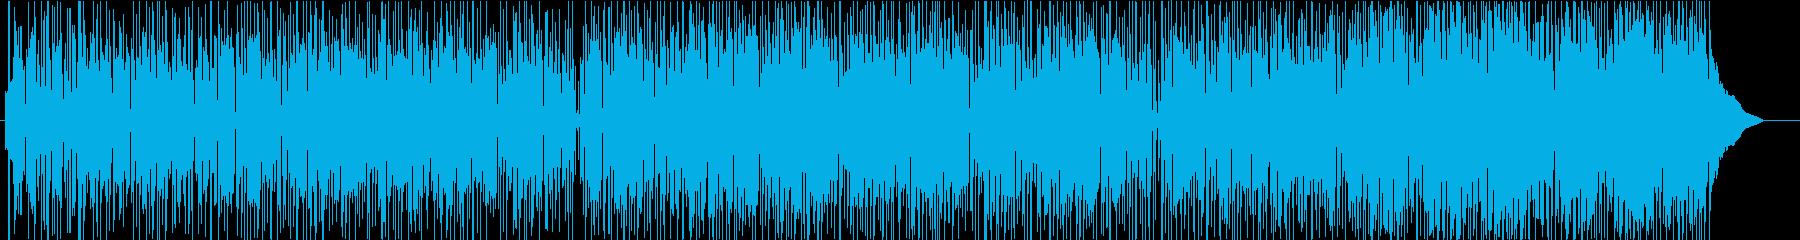 Easy Tempoの再生済みの波形